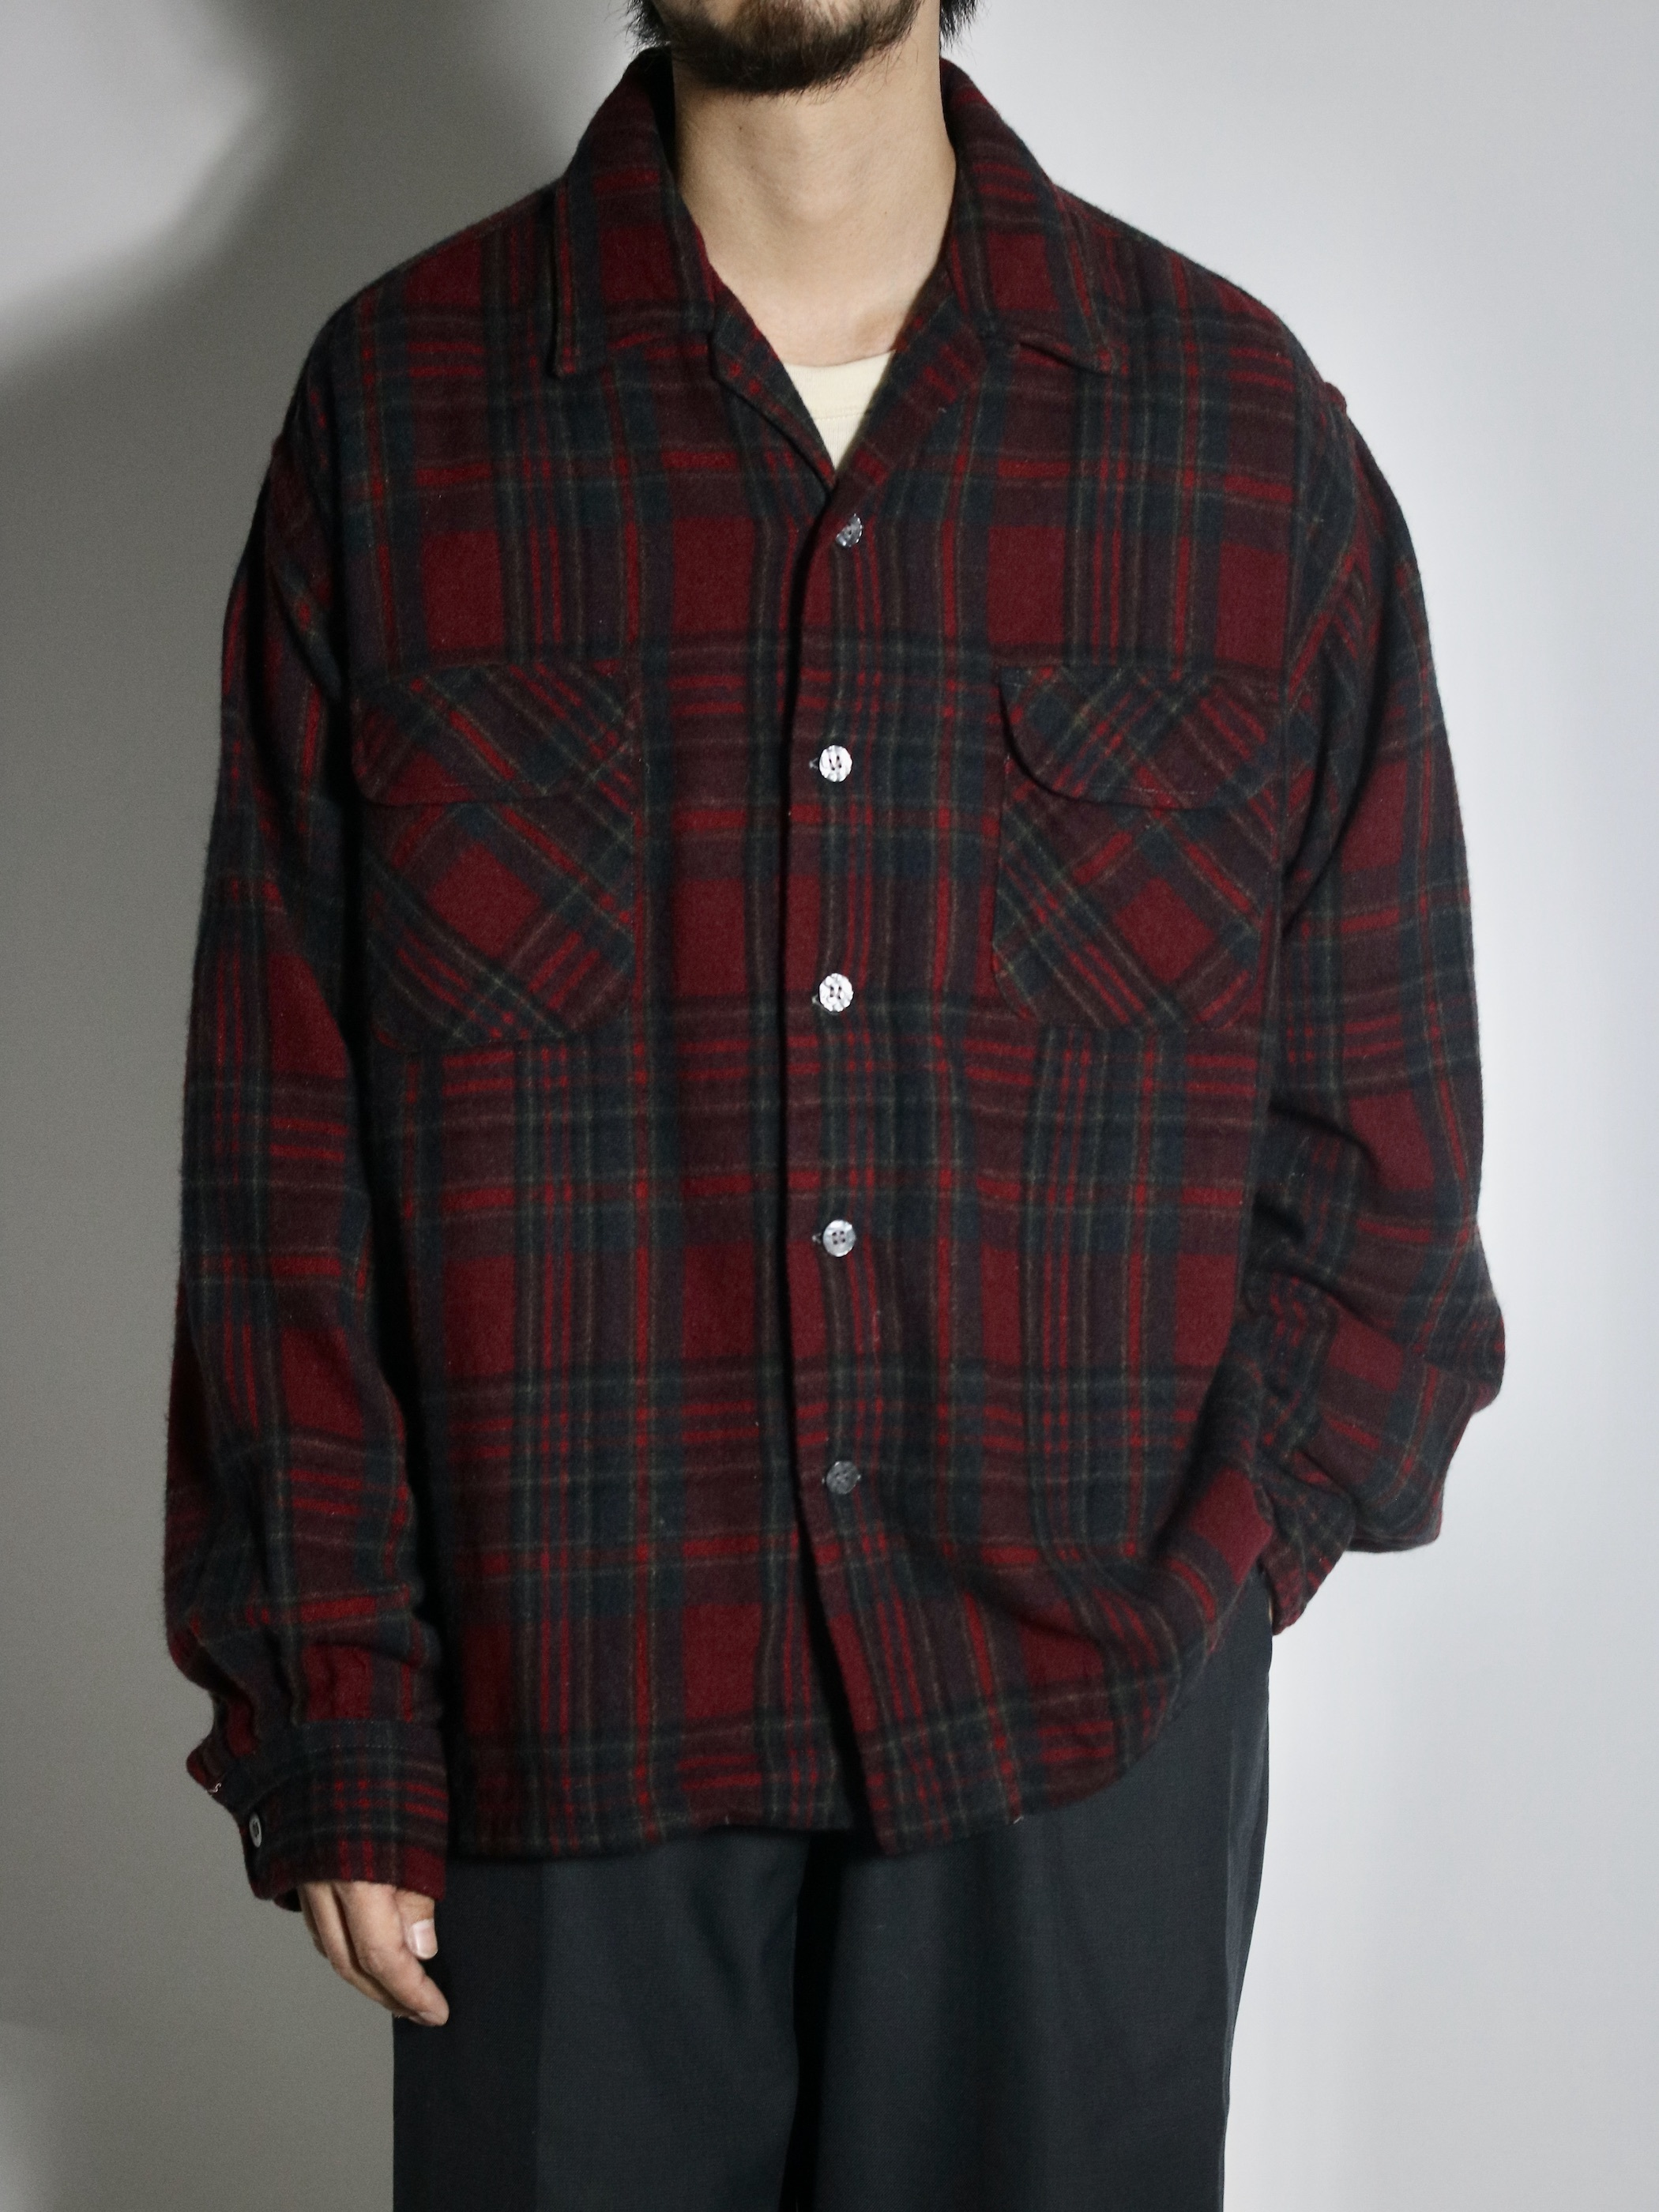 1960~70's Sears Roebuck Wool Open collar Shirts